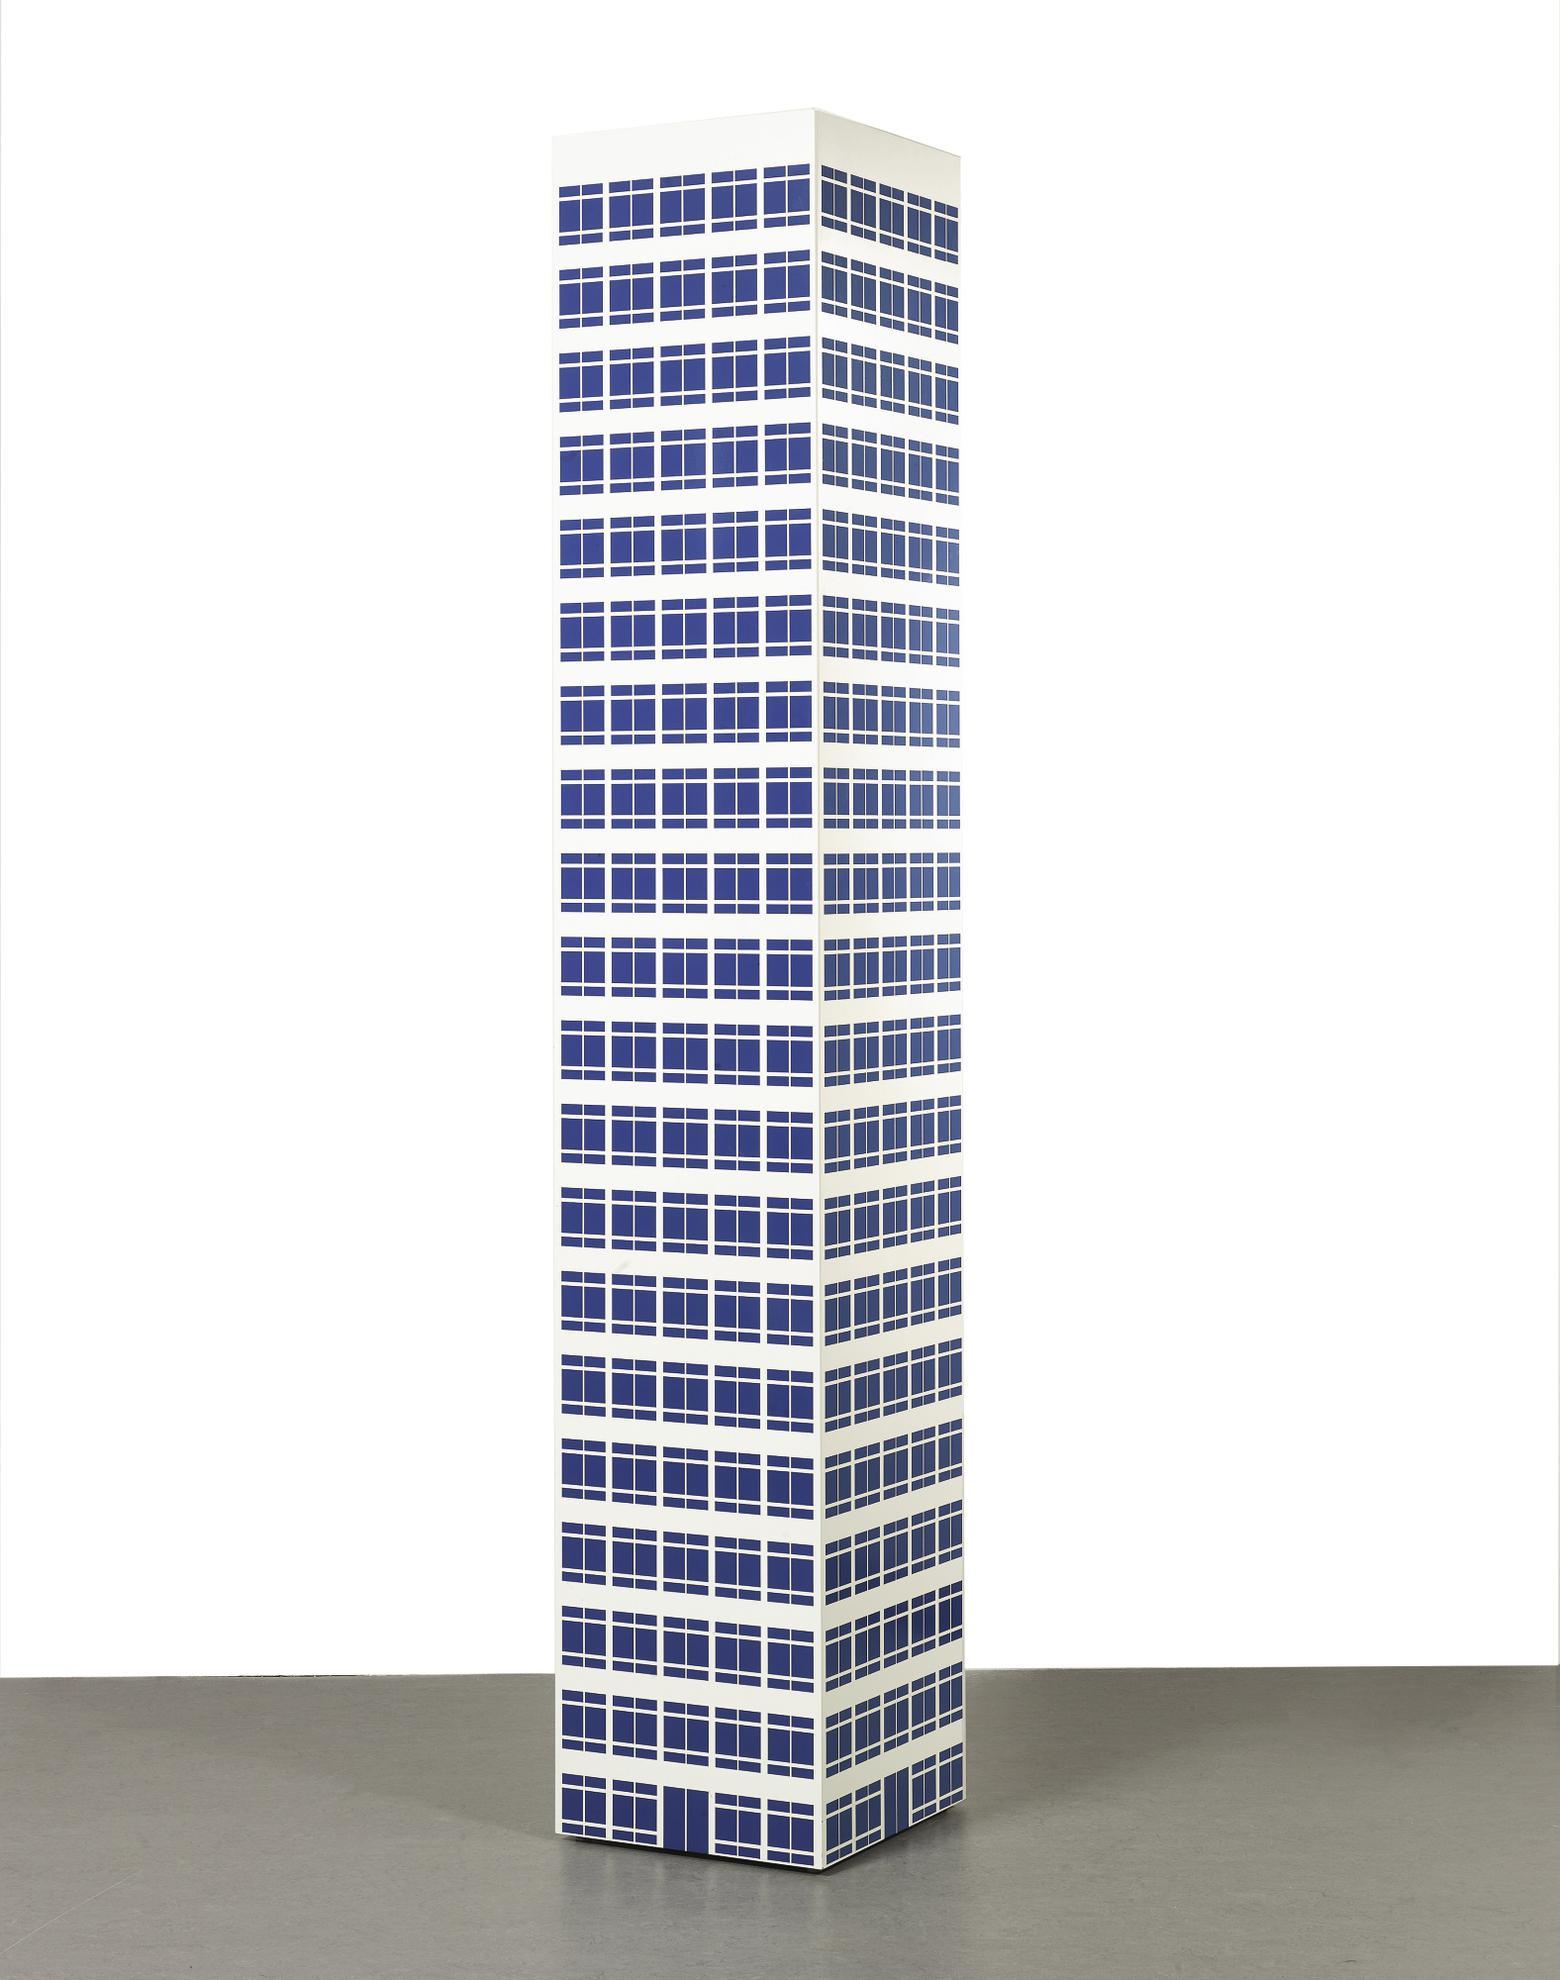 Julian Opie-Modern Tower 9-2001